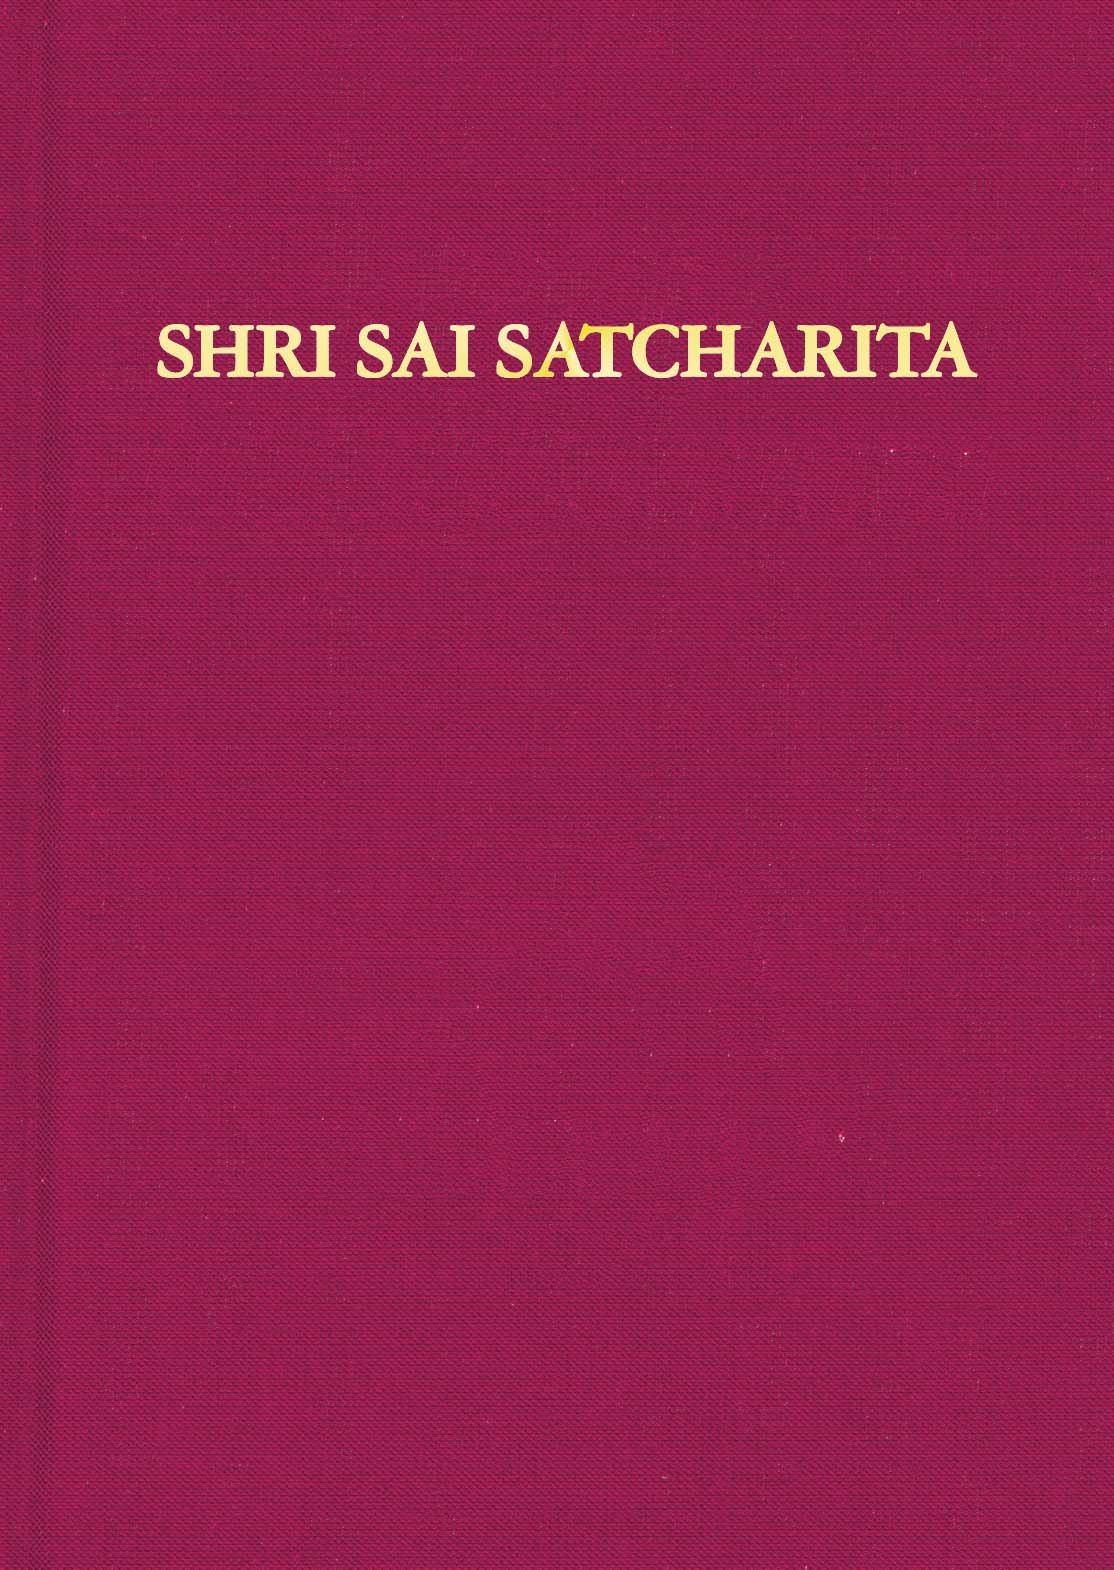 Shri Sai Satcharita: Leben und Lehren des Shri Sai Baba von Shirdi